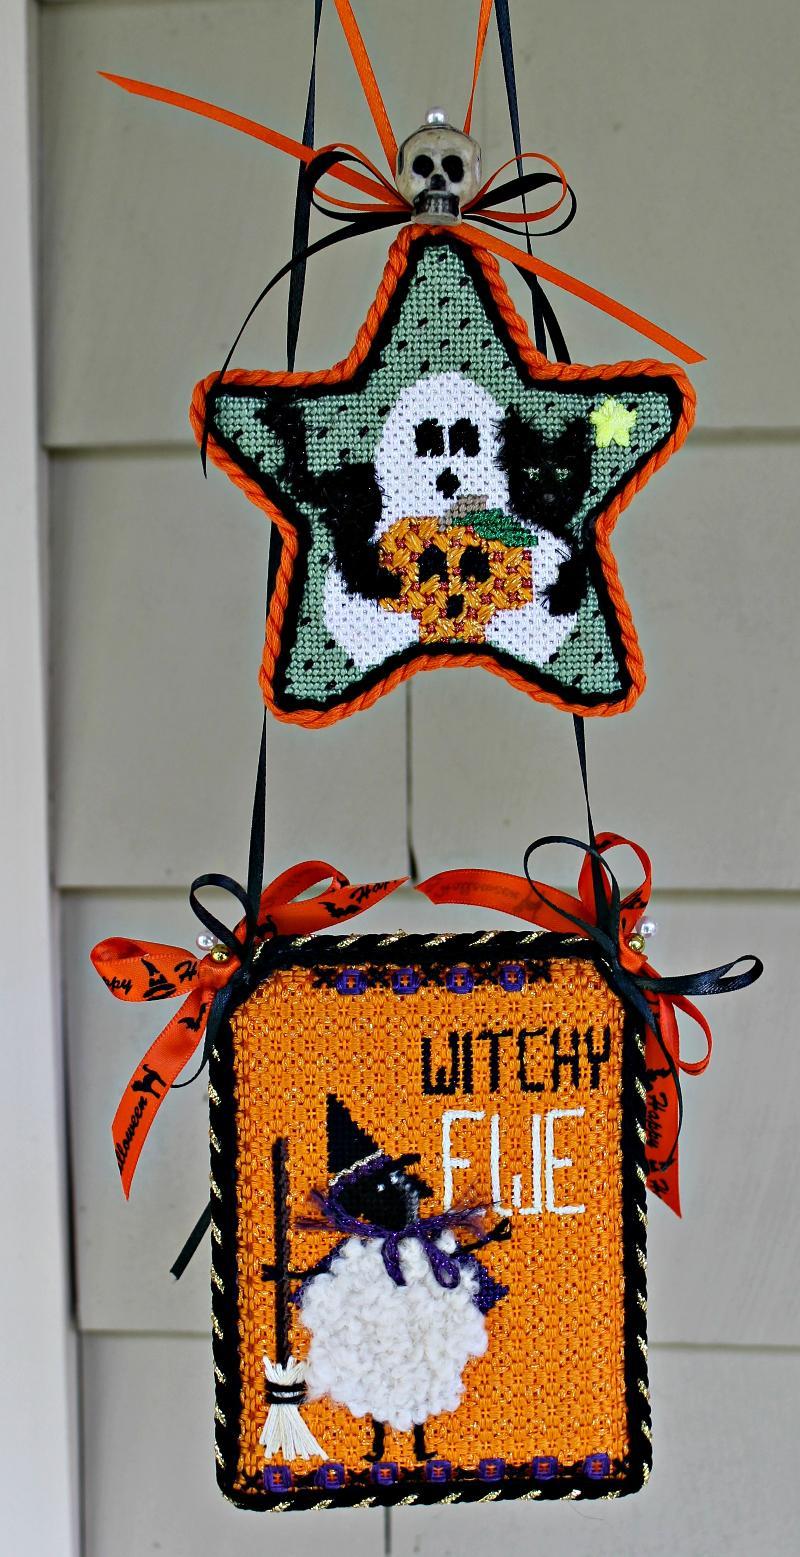 2 Hanging Halloween Decorations